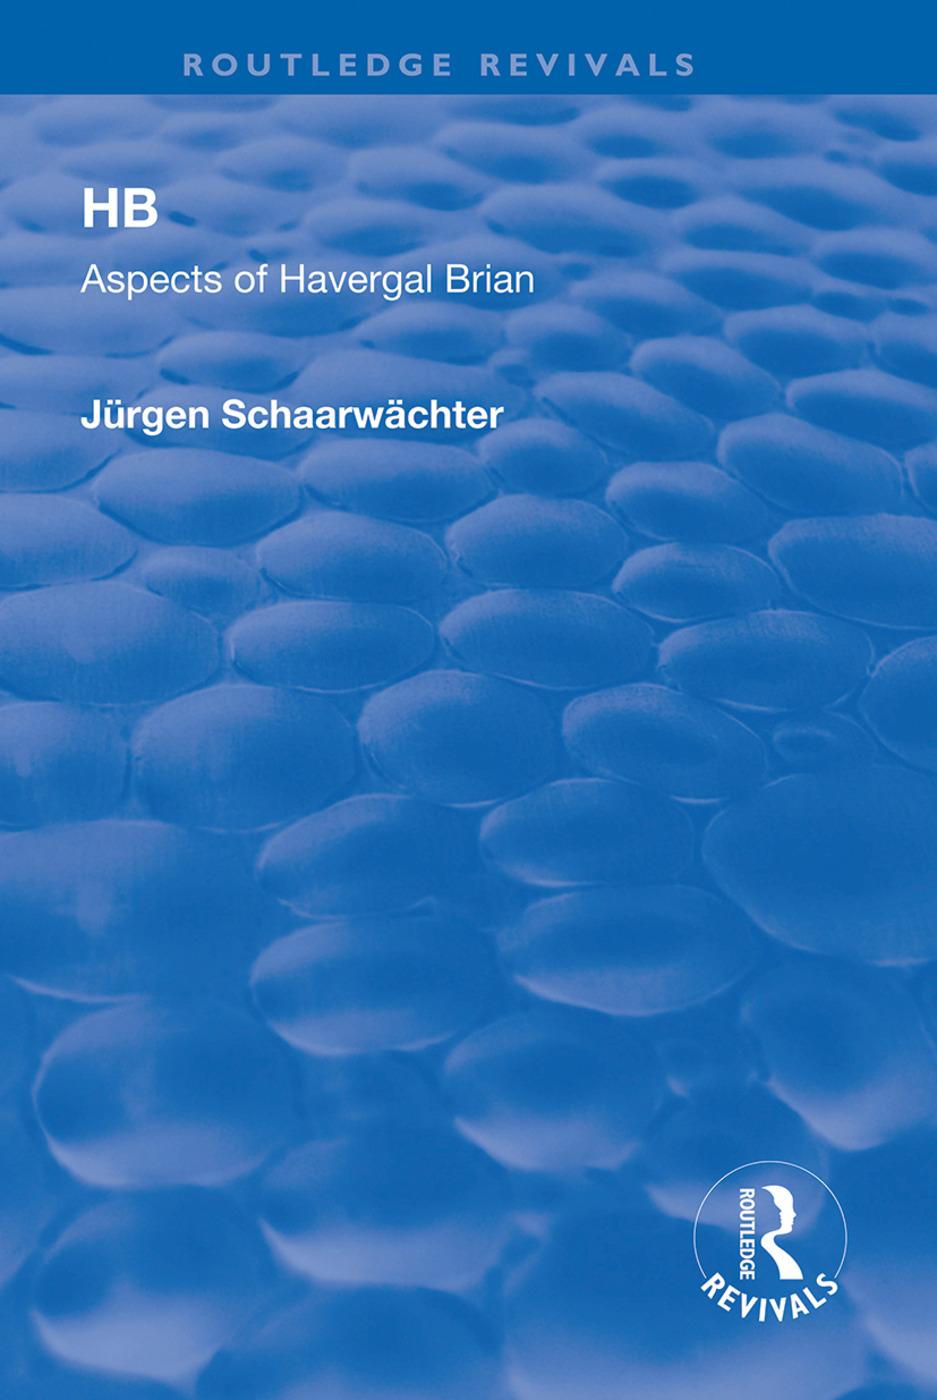 HB: Aspects of Harvergal Brian: Aspects of Harvergal Brian book cover